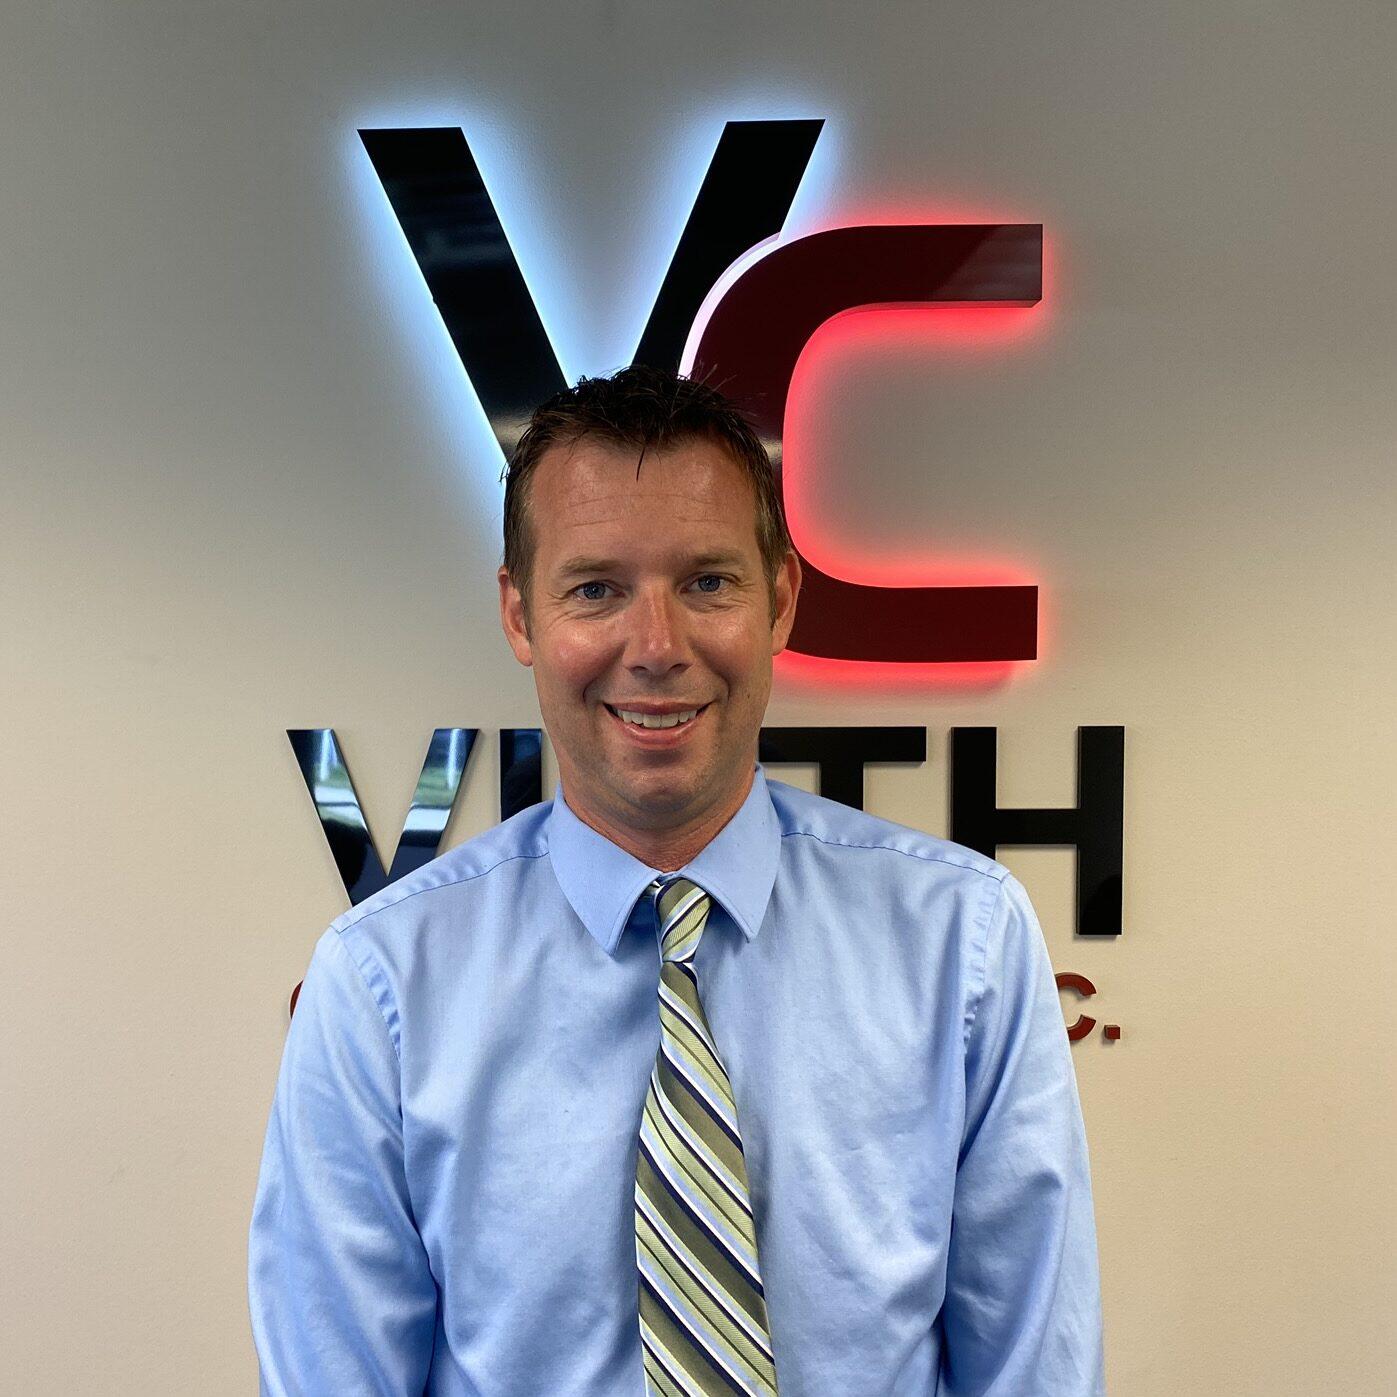 Daniel Vieth